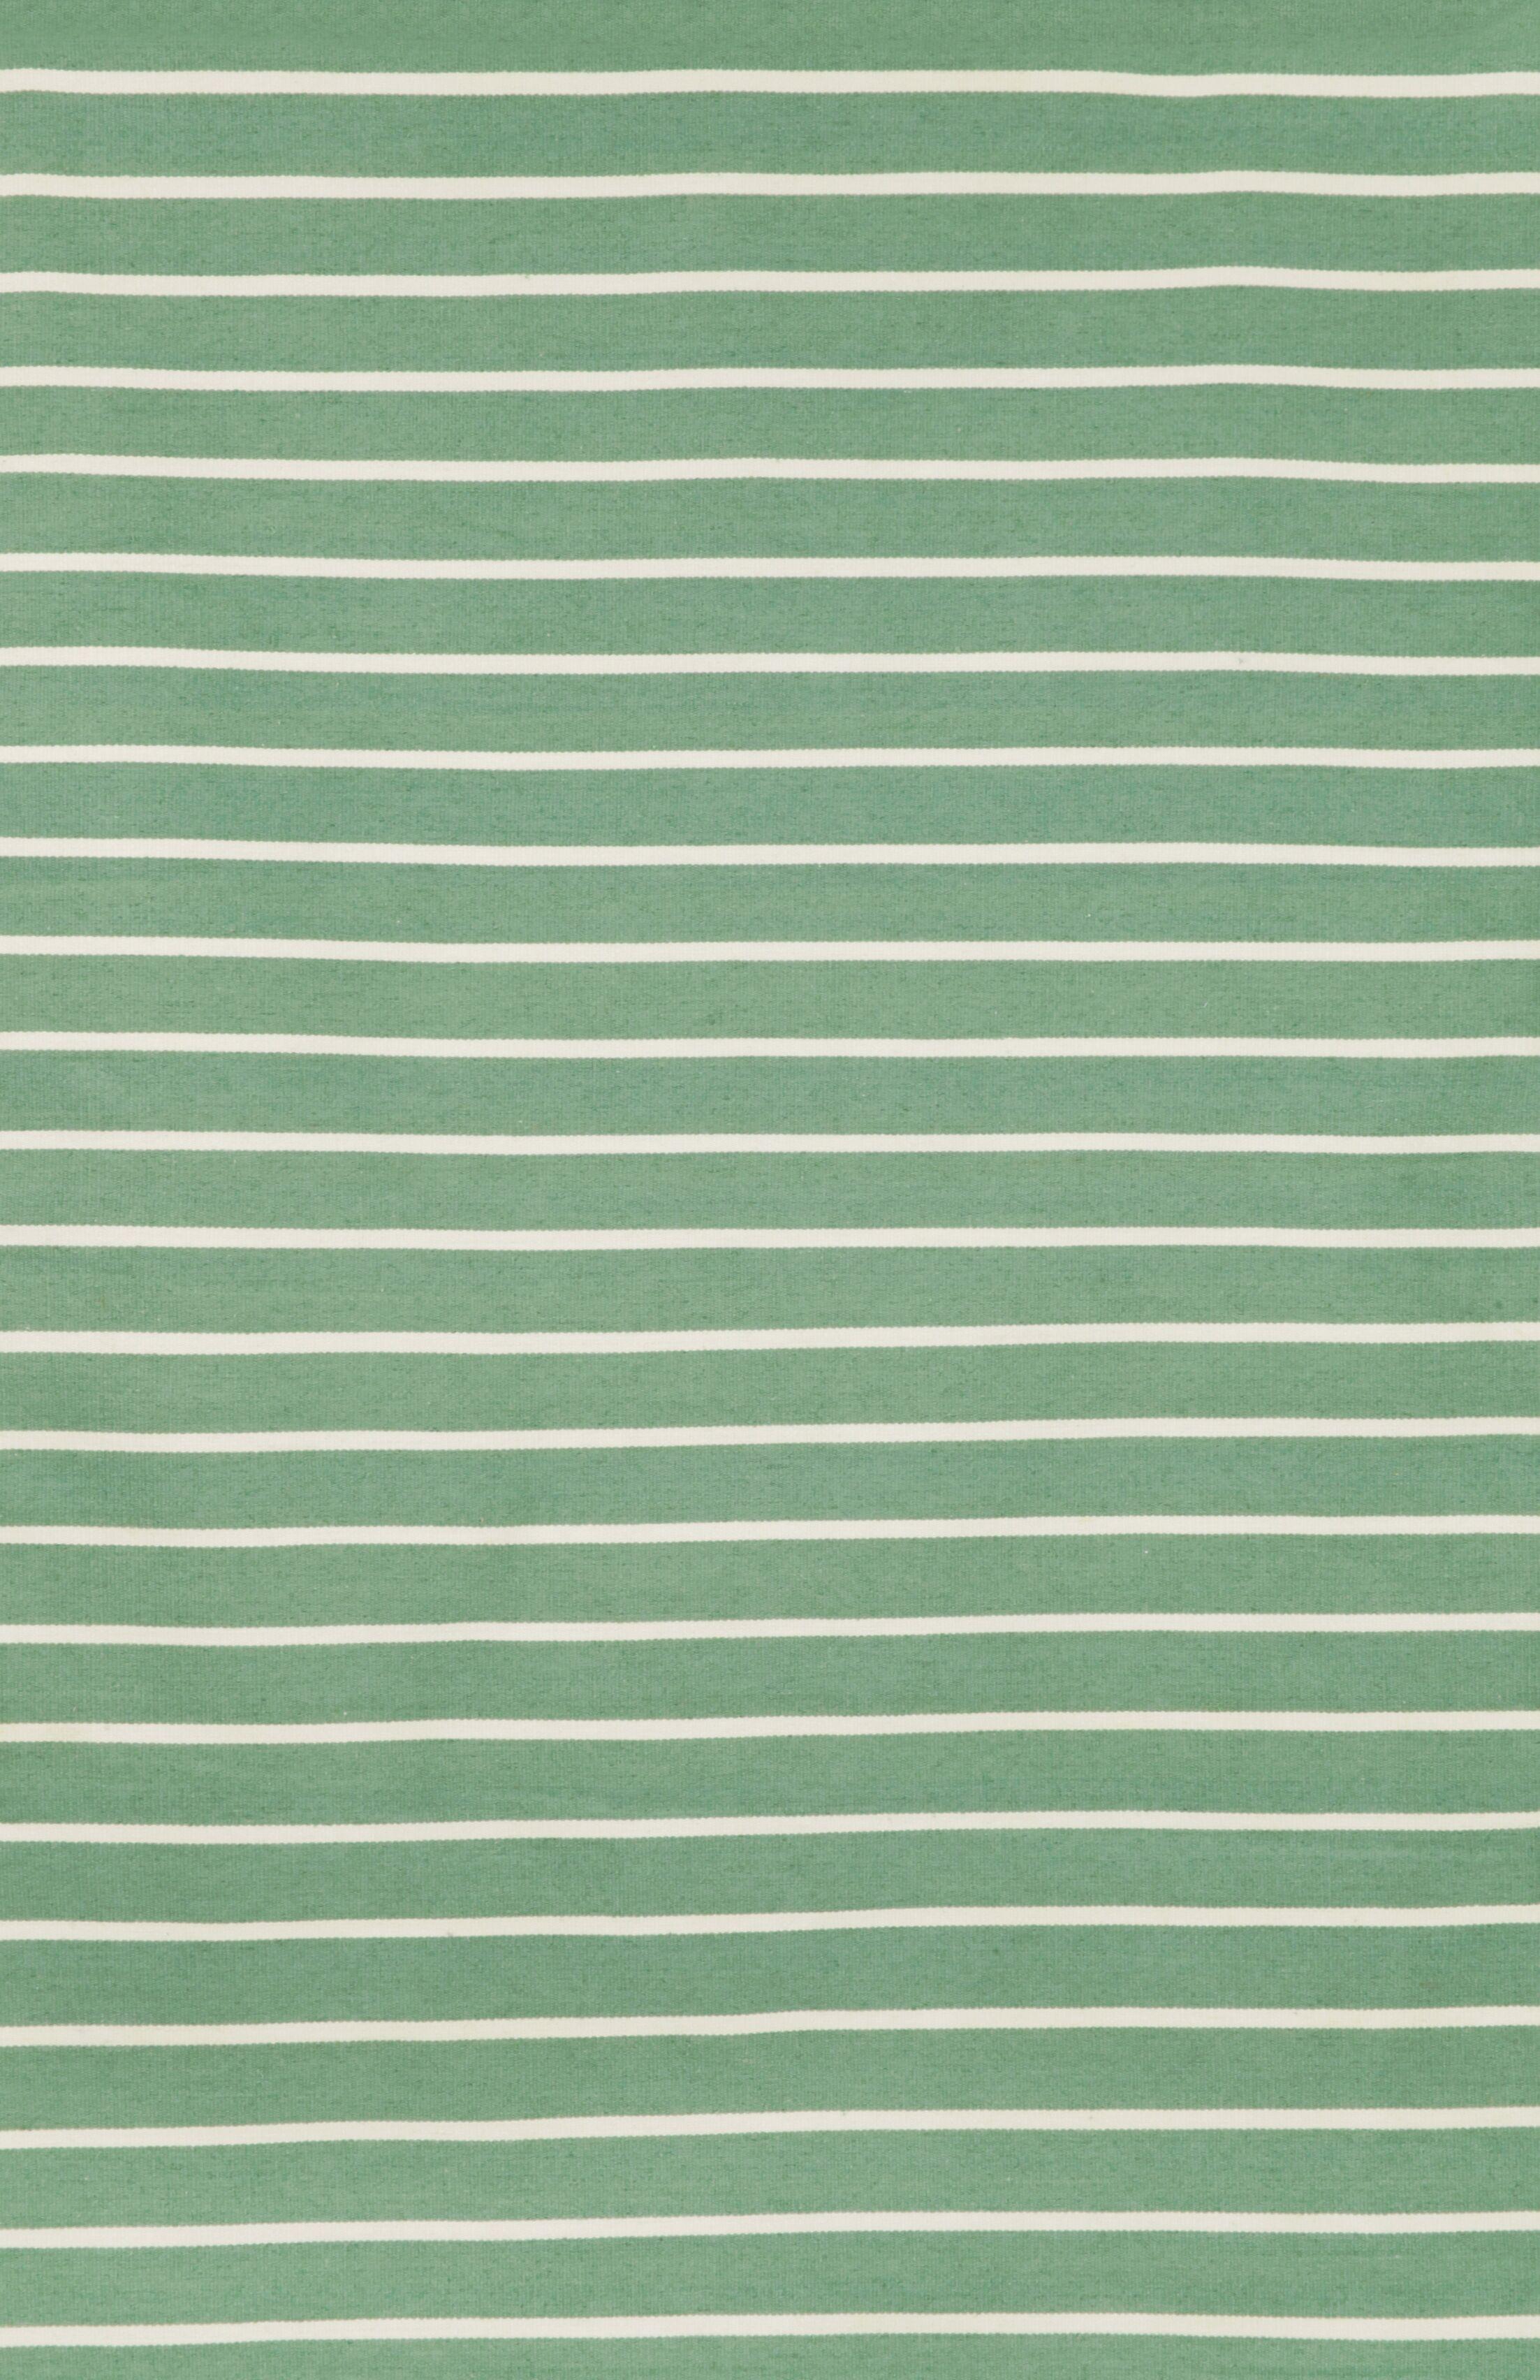 Ranier Pinstripe Hand-Woven Aqua Indoor/Outdoor Area Rug Rug Size: Rectangle 5' x 7'6